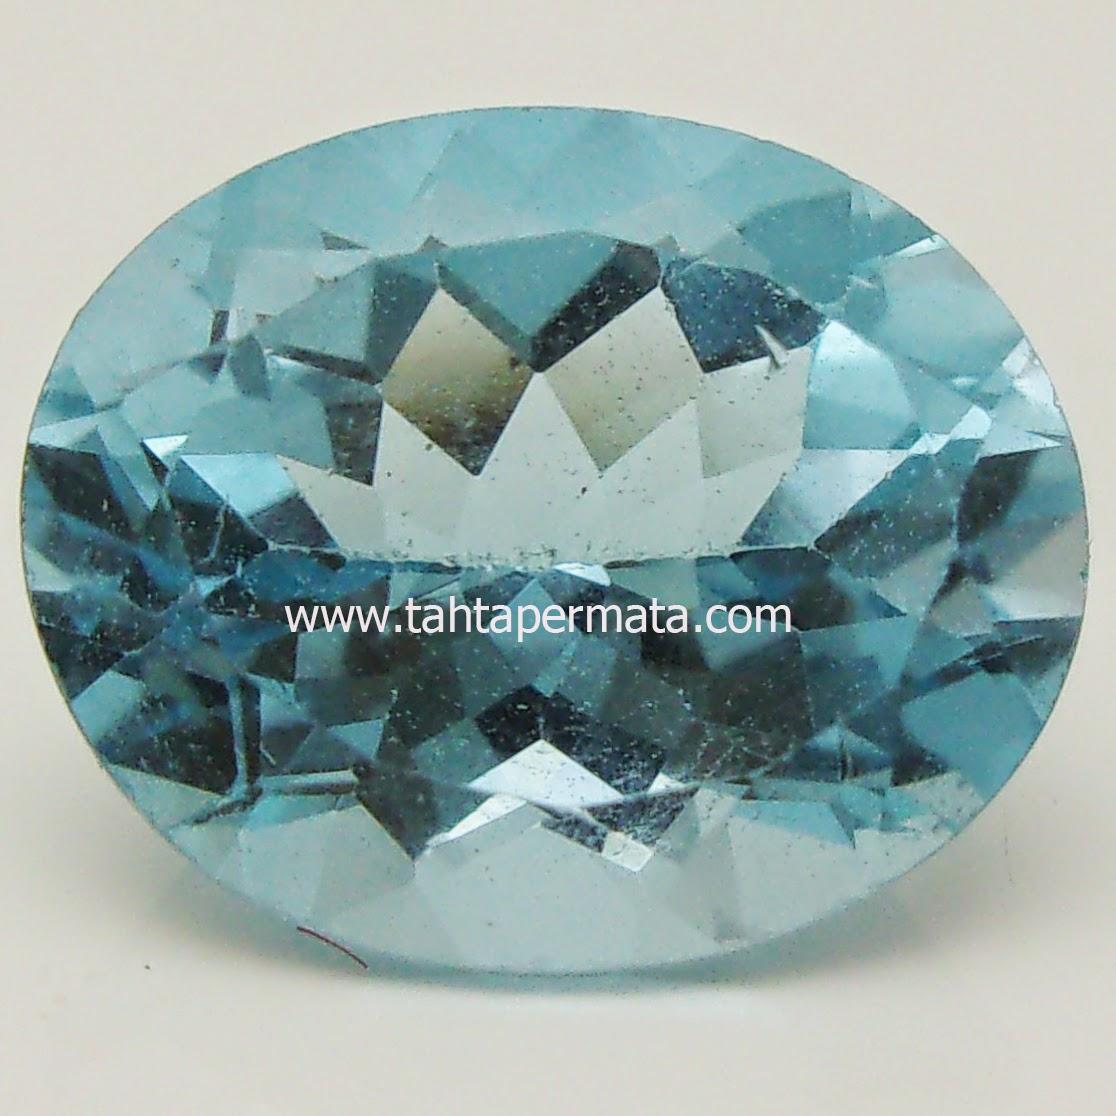 ... permata Jual Batu Permata Asli Natural Cincin Permata Batu Mulia Dan